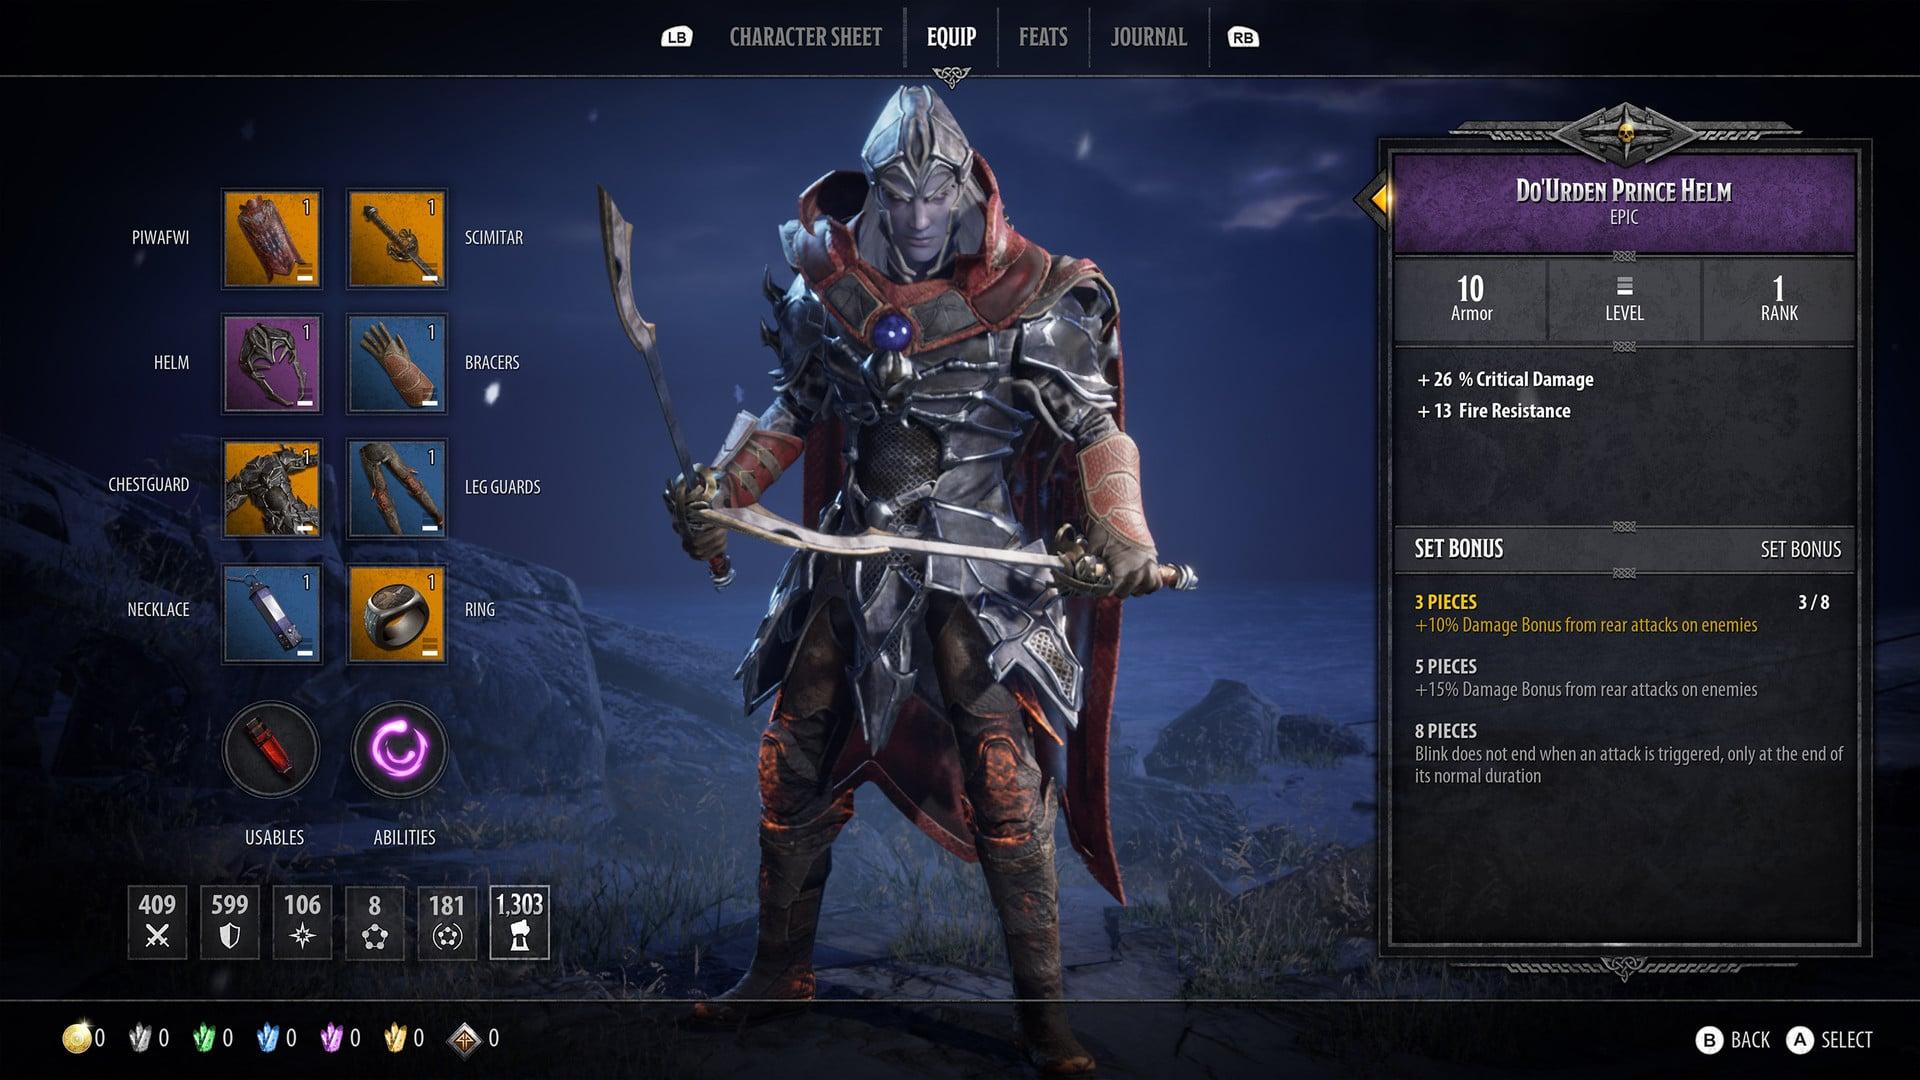 Dungeons & Dragons: Dark Alliance interview Tuque Games lead level designer Jean-Francois Champagne